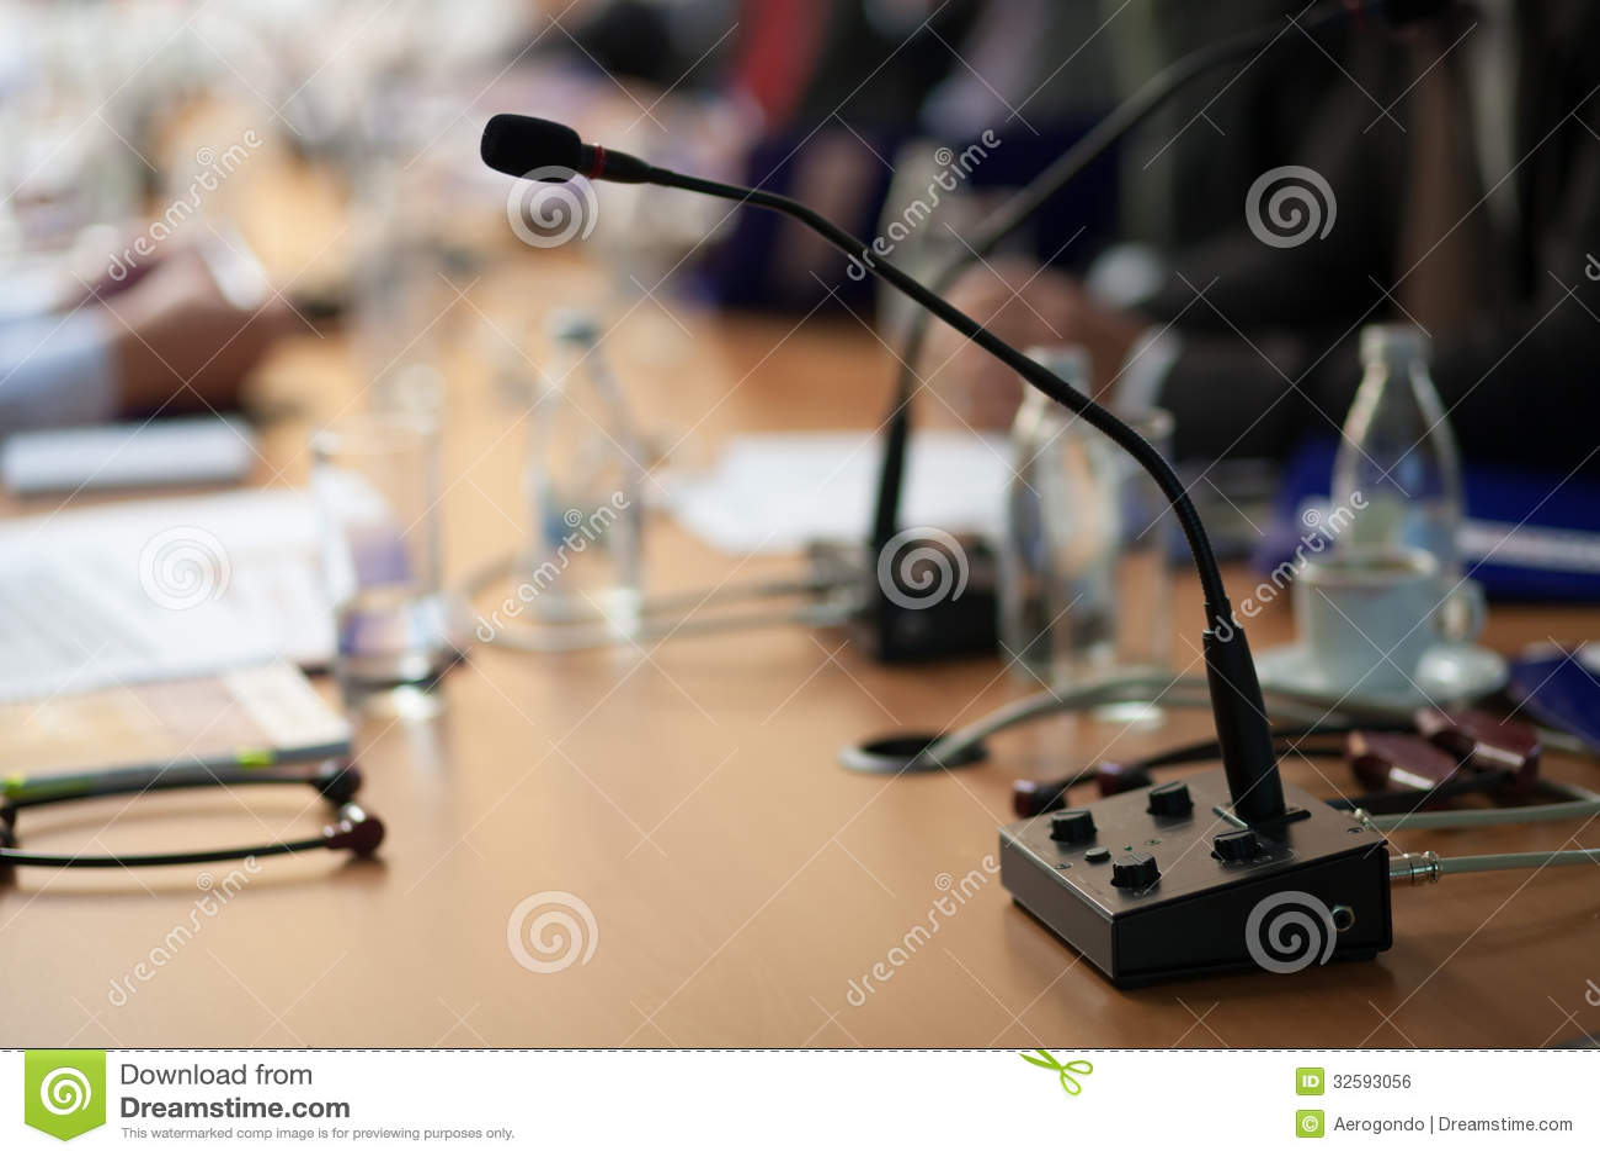 Michrophone na tabela de conferência